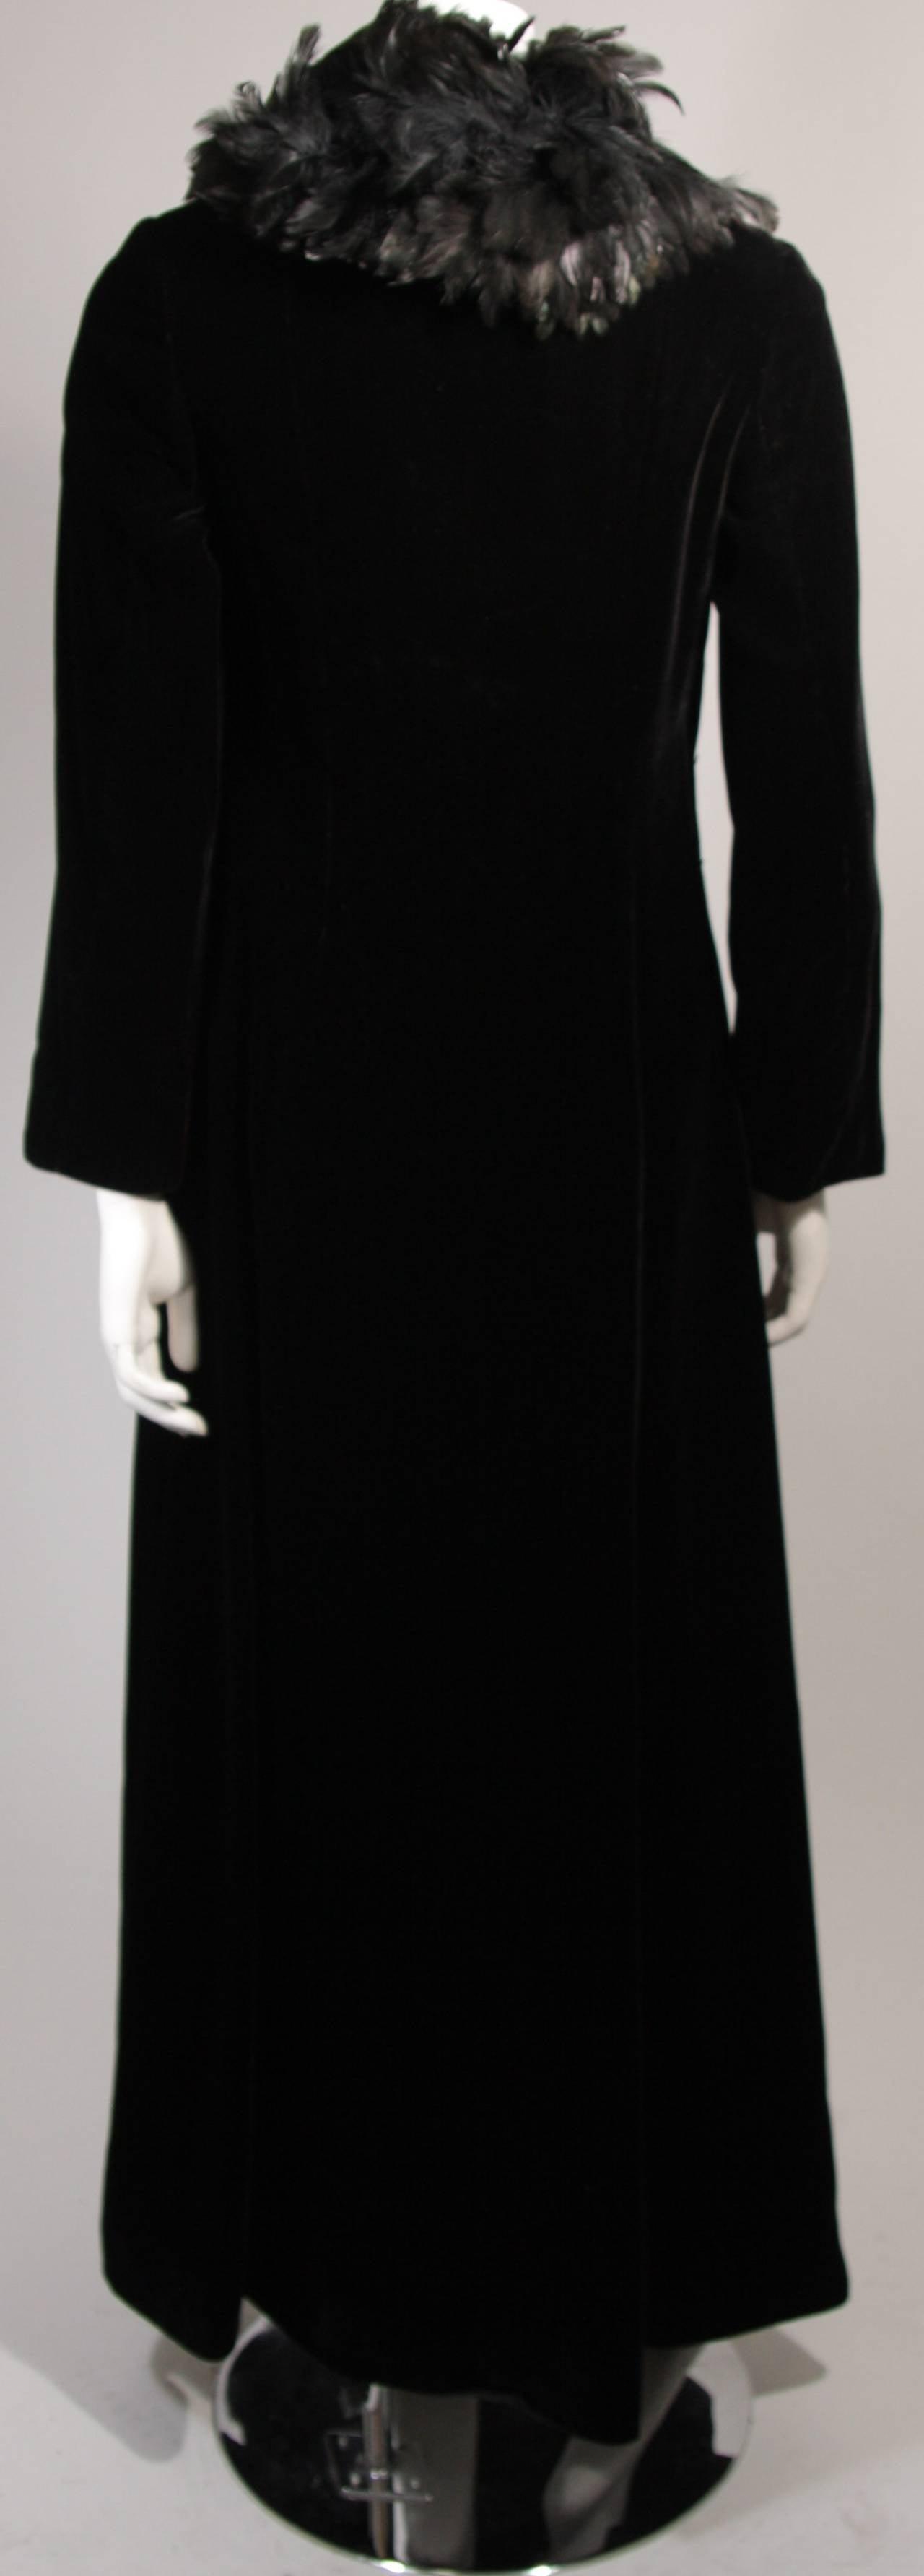 Velvet Feather Trim Coat Size 8 Victoria Royal For Sale 3